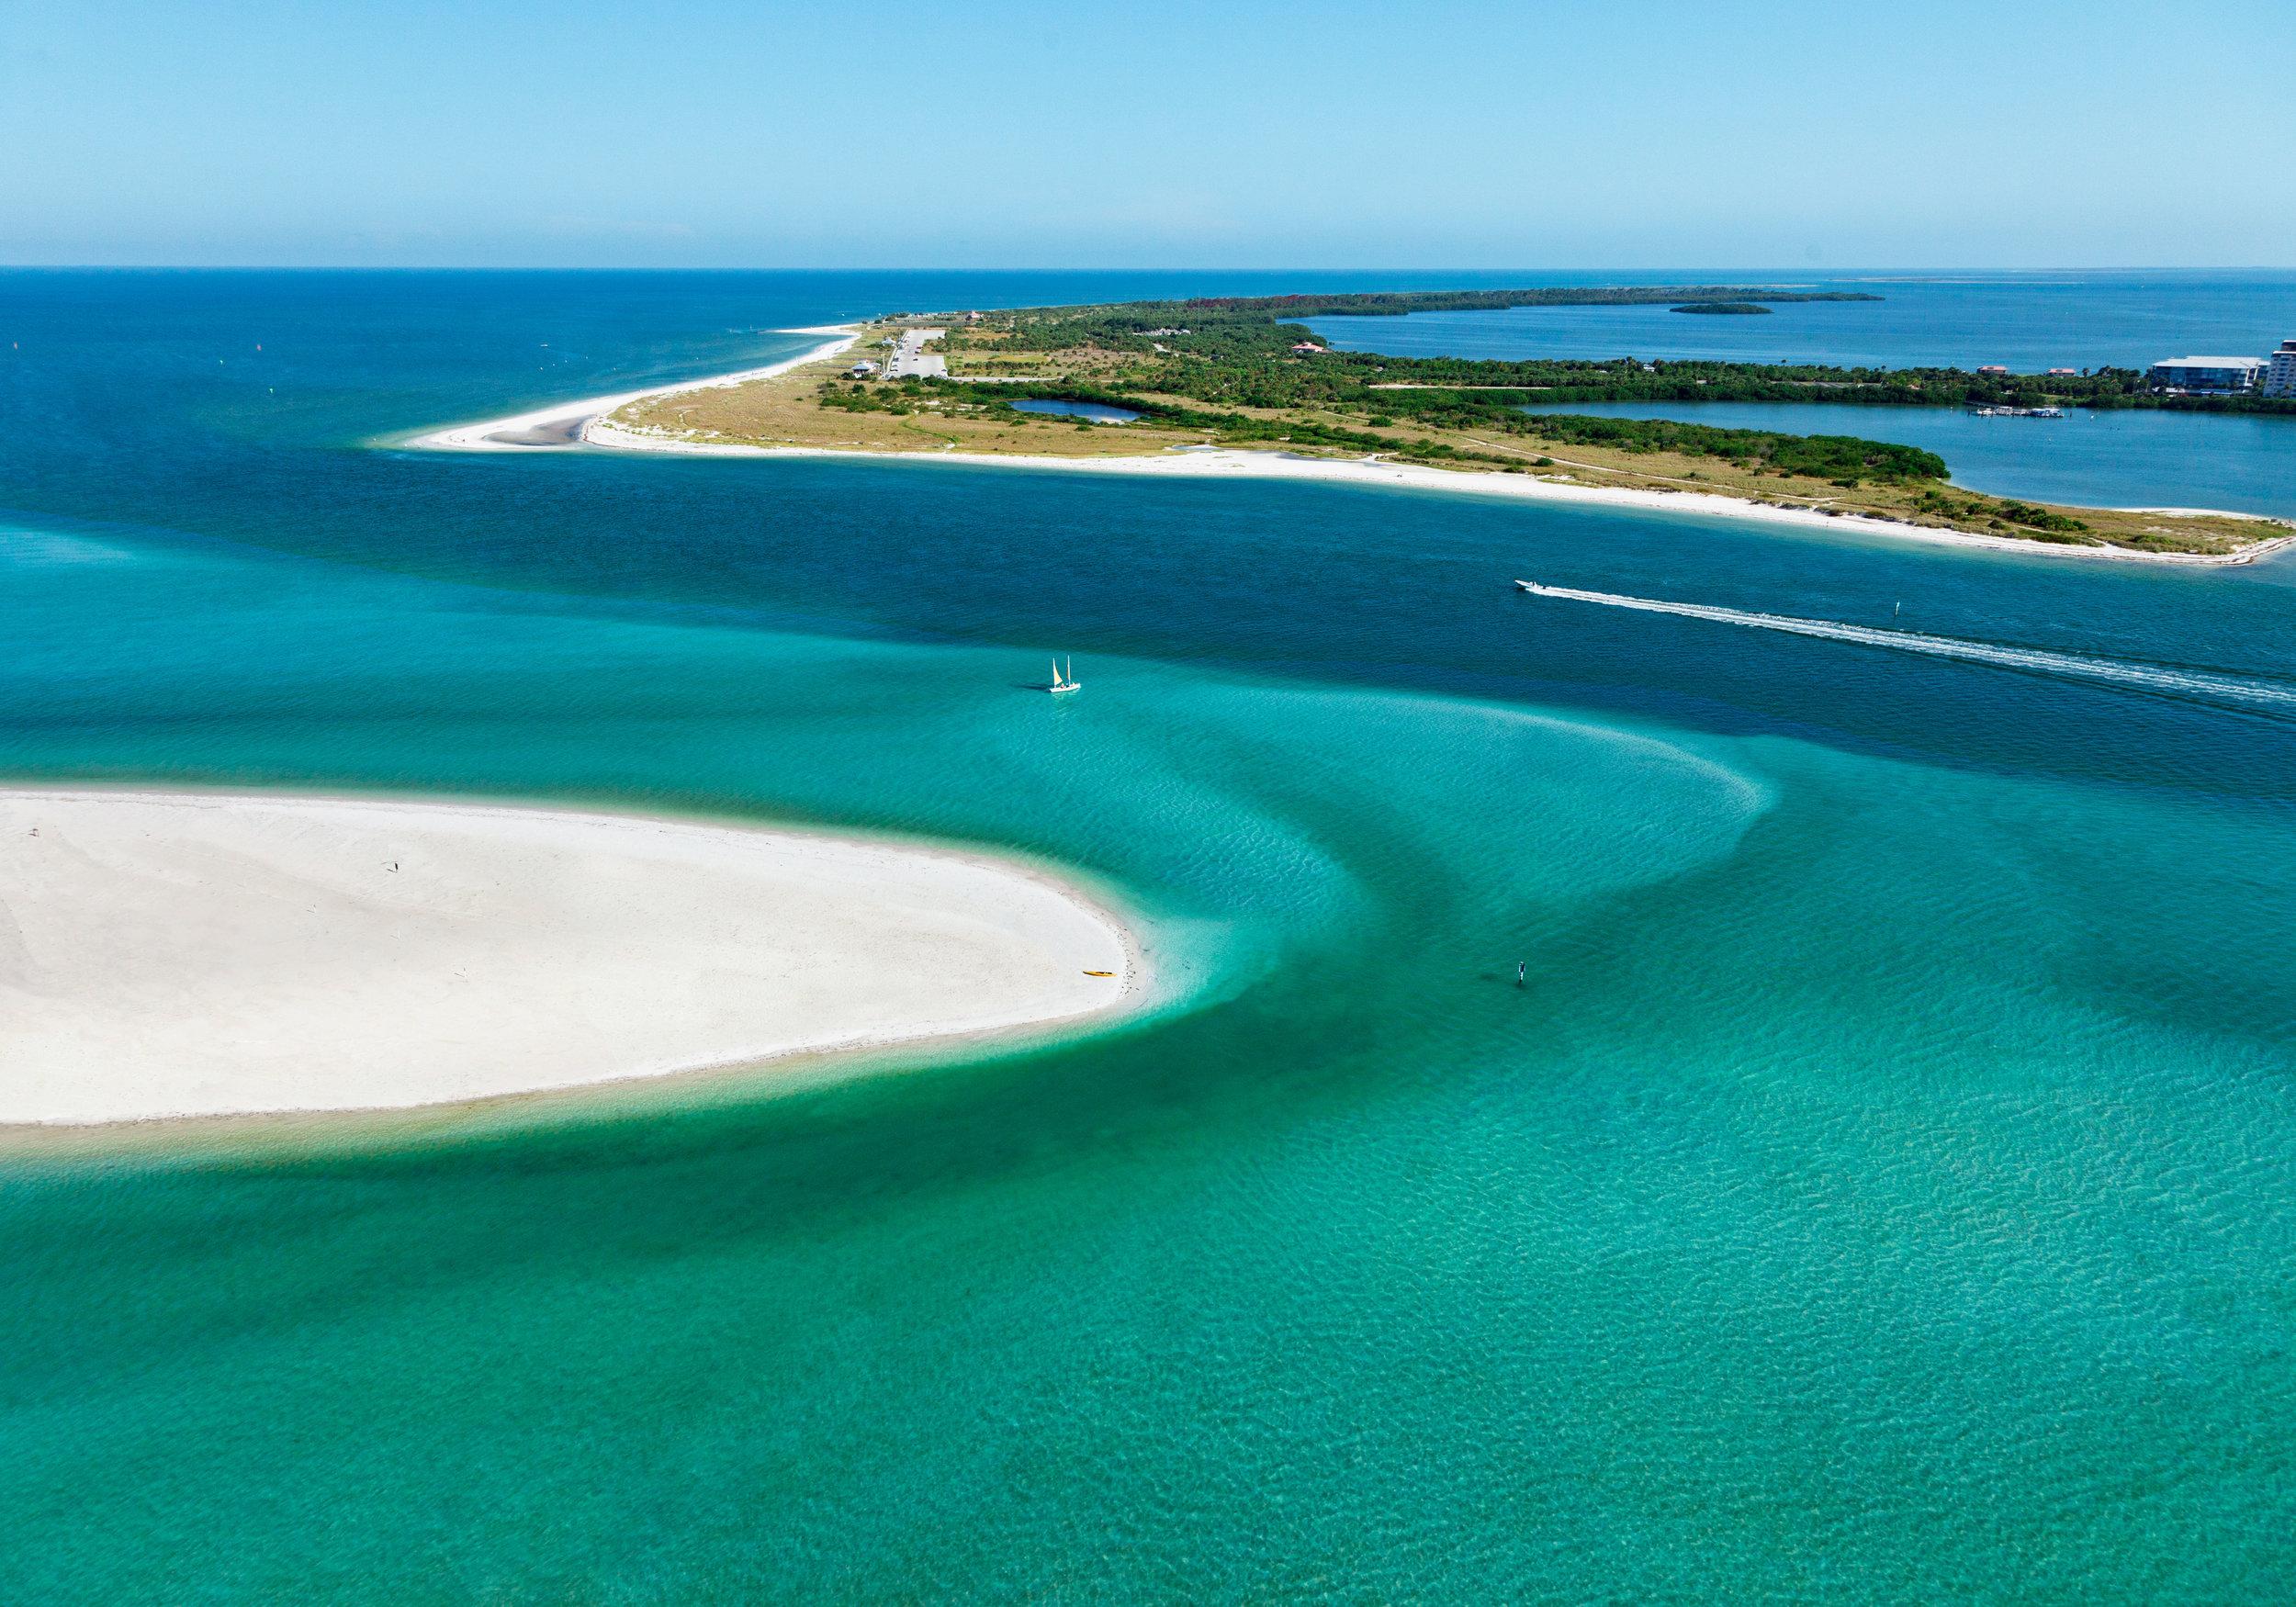 Caladesi_Island_State_Park_(l)_and_Honeymoon_Island_State_Park_(r).jpg